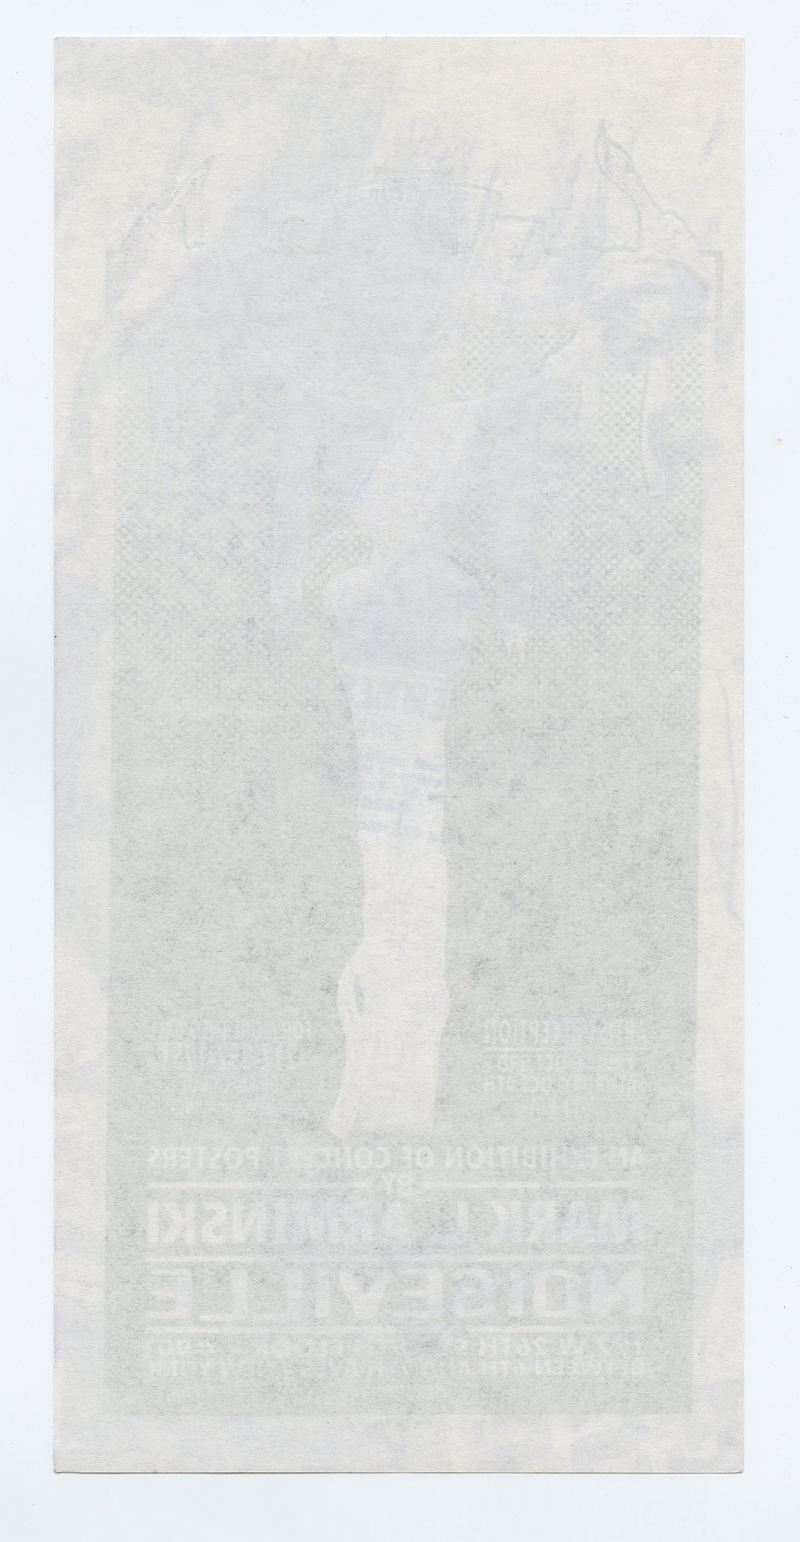 Mark Arminski Hadnbill  997 NY Exhibit Beware the Future of the Arts